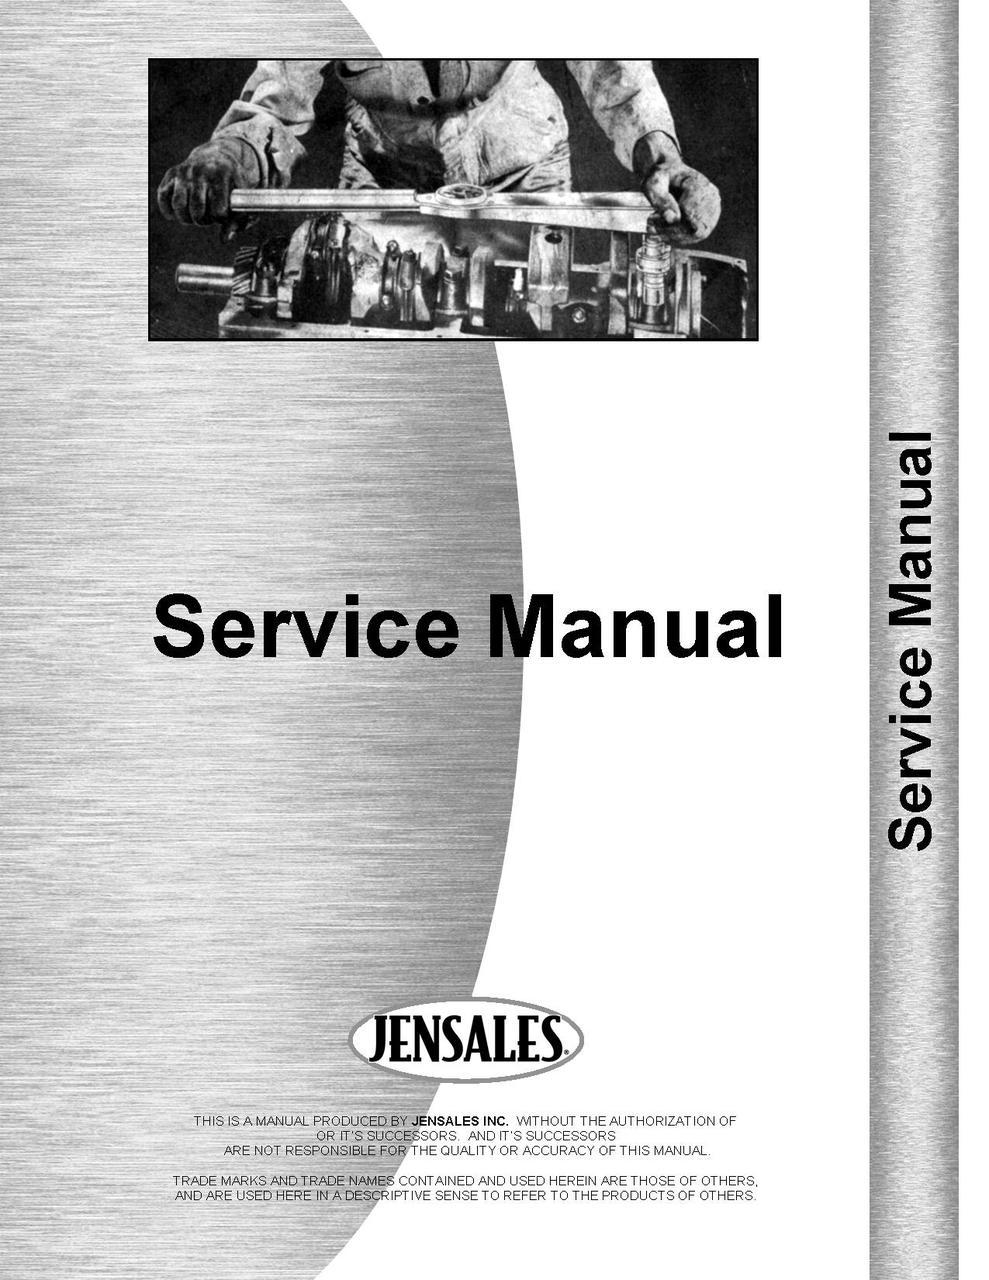 simplicity 4040 lawn garden tractor onan engine service manual rh agkits com Onan Engine Model Numbers onan engine service manual pdf